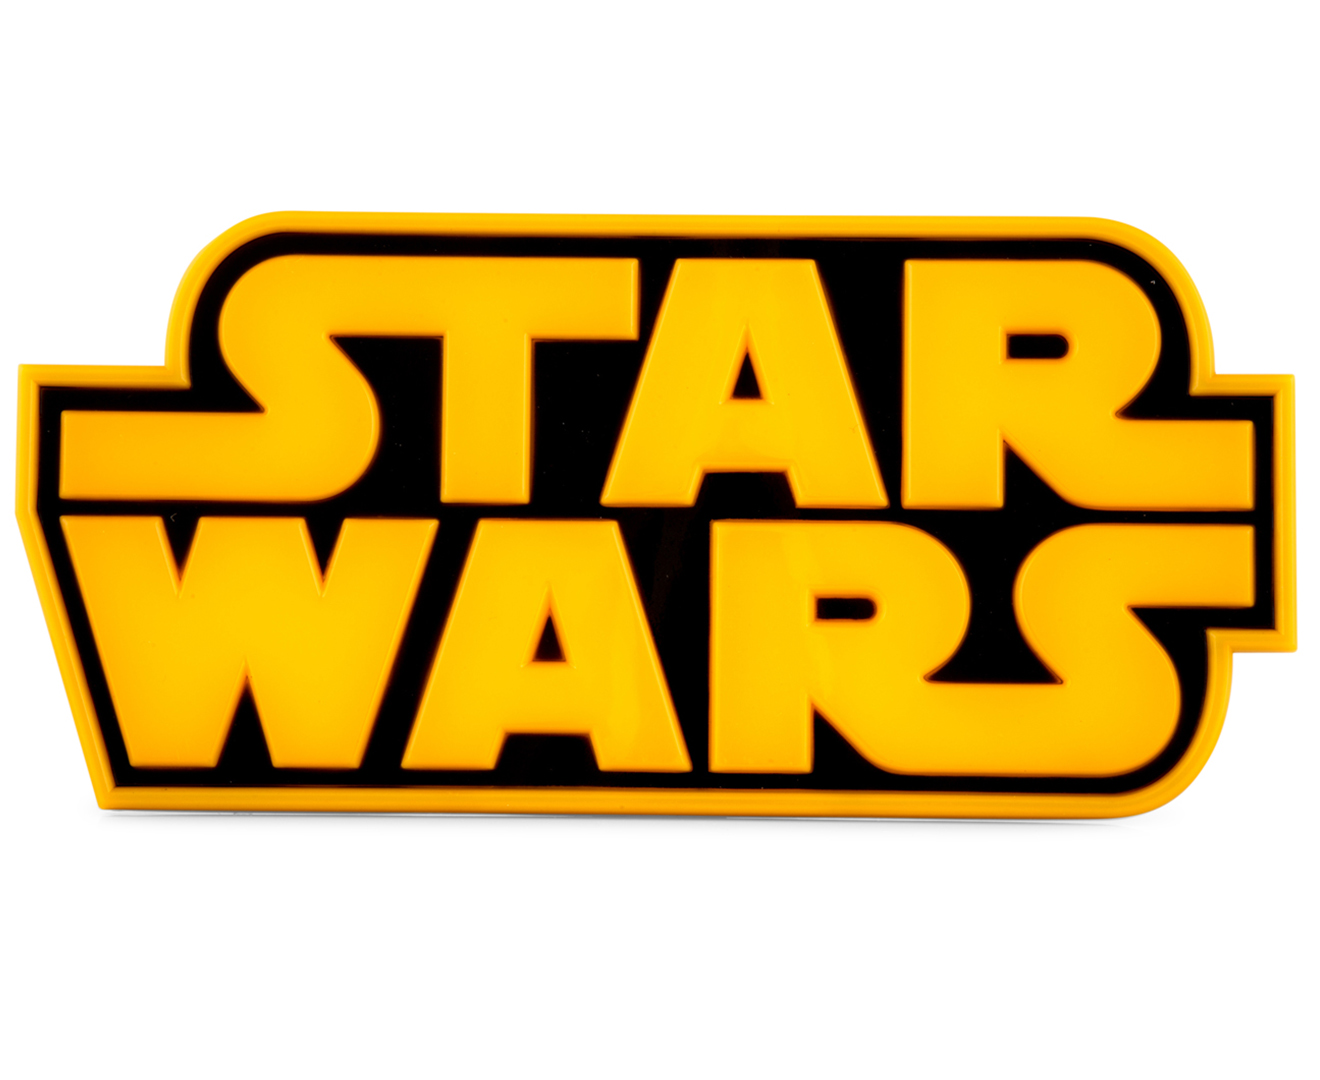 star wars logo - HD1320×1080